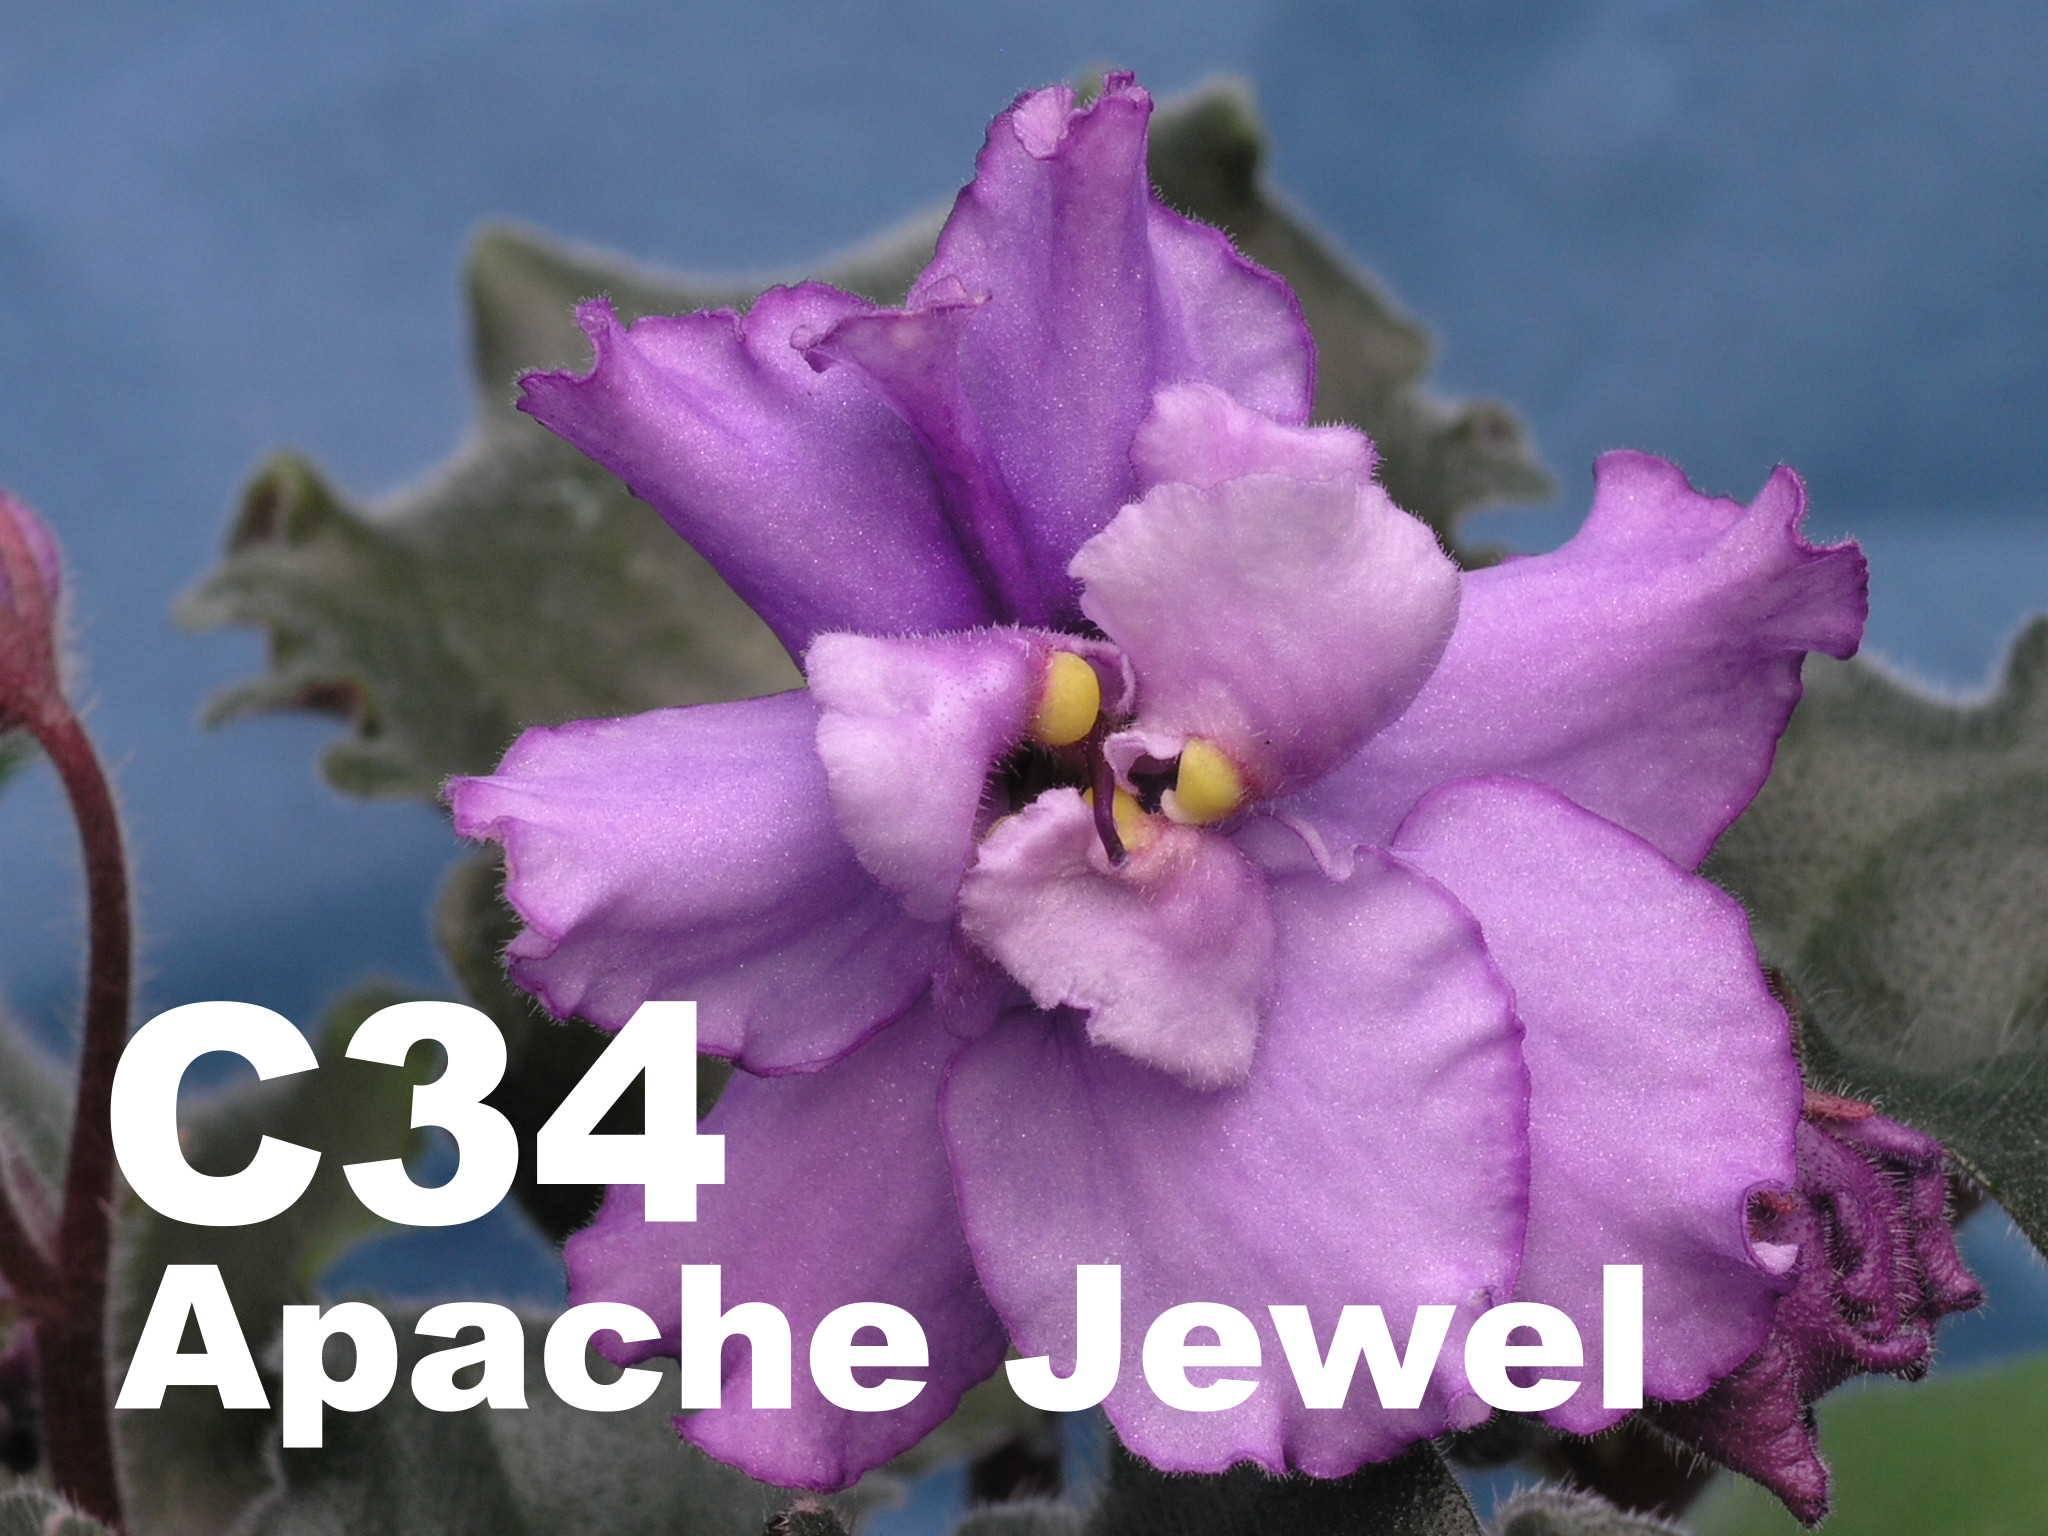 非洲紫羅蘭名錄 | African Violets Catalogue - C系列 C34